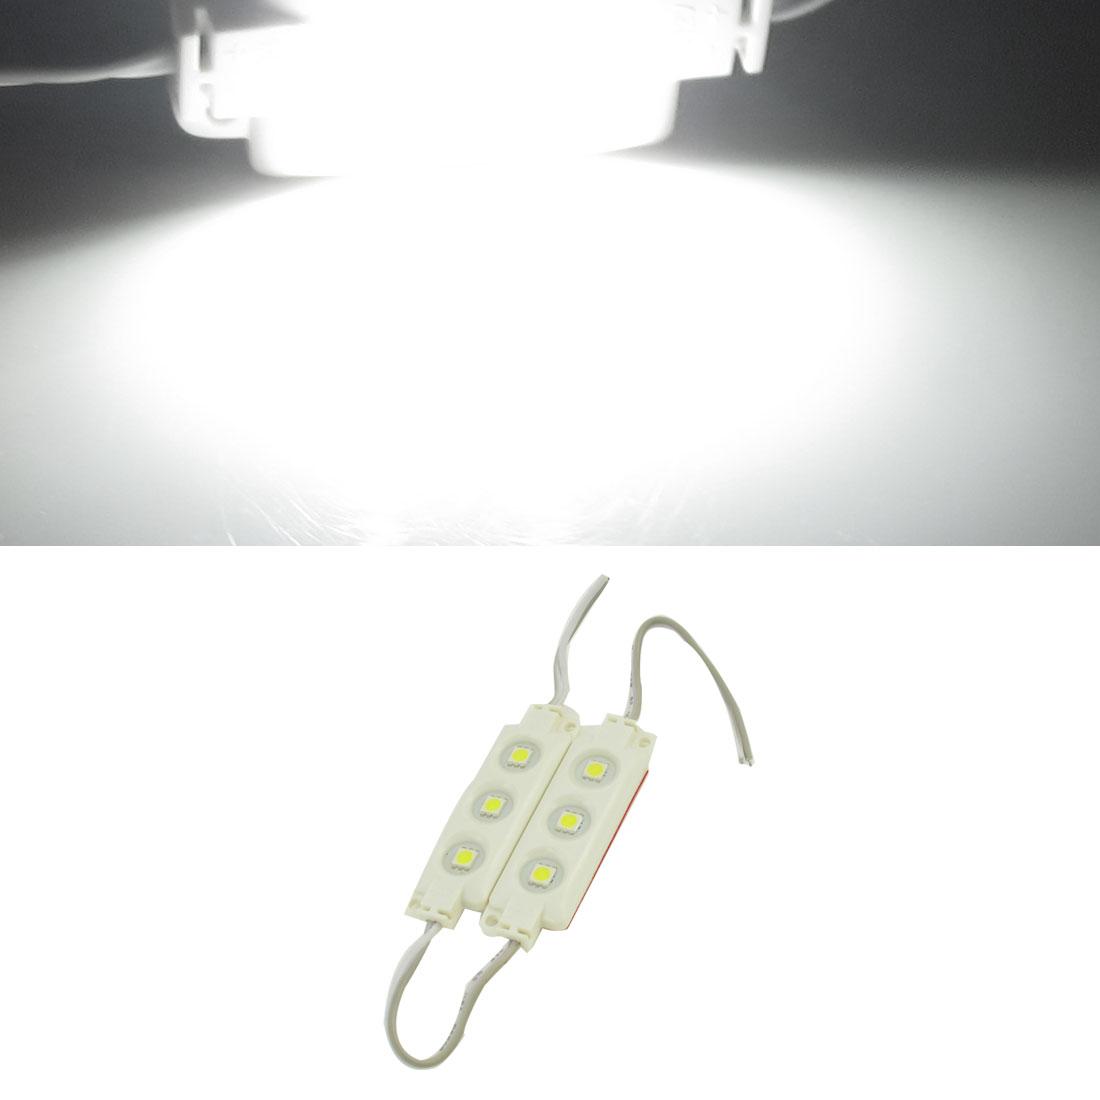 SMD5050 DC12V 0.72W Waterproof 6 White LED Module Light